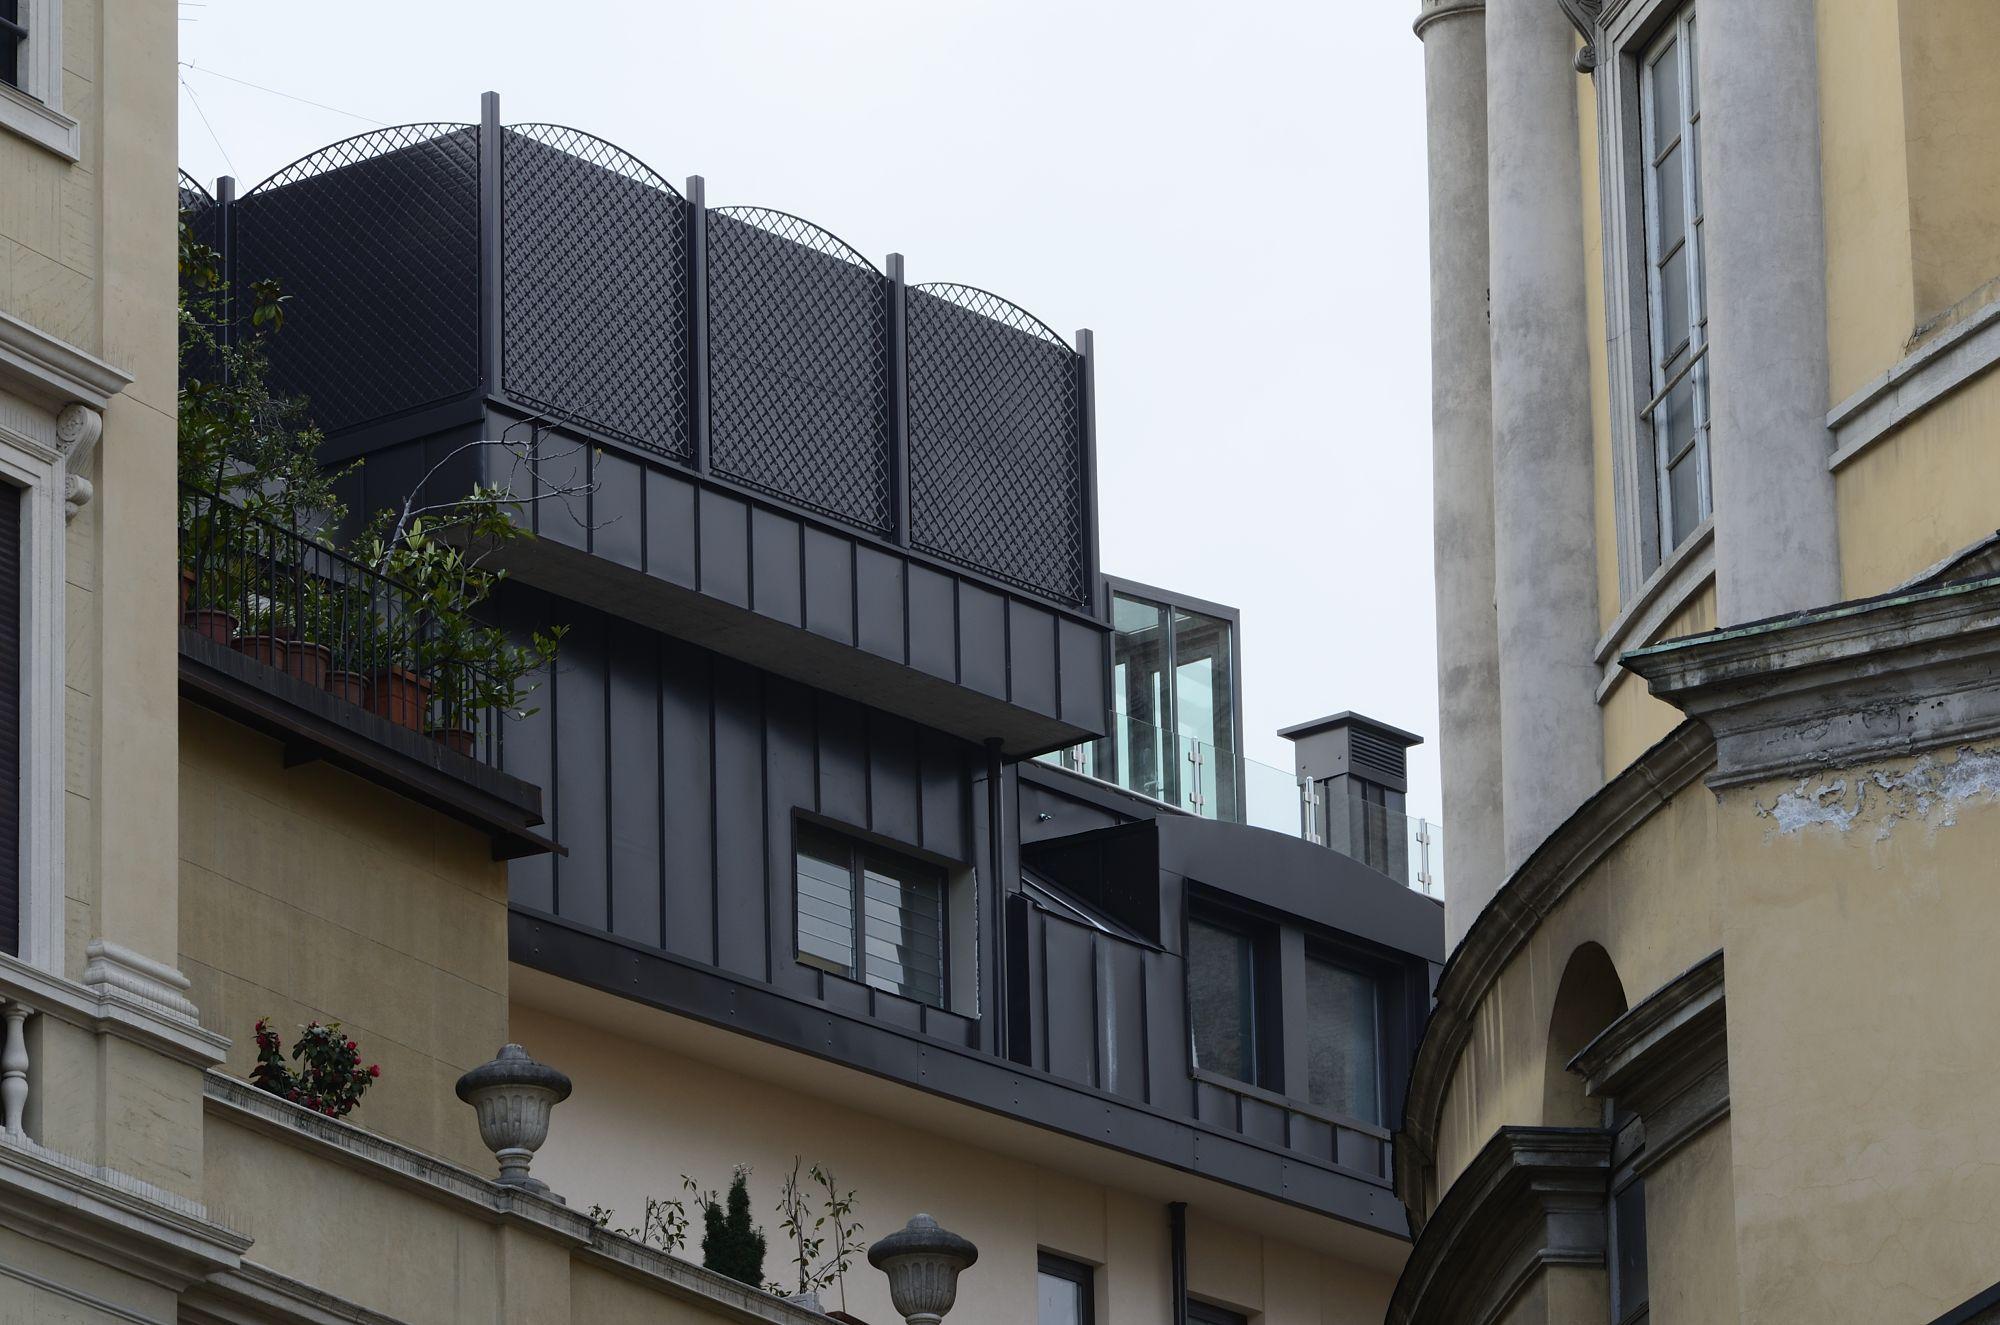 Residenziale Milano - Via San Pietro all'Orto - image 5